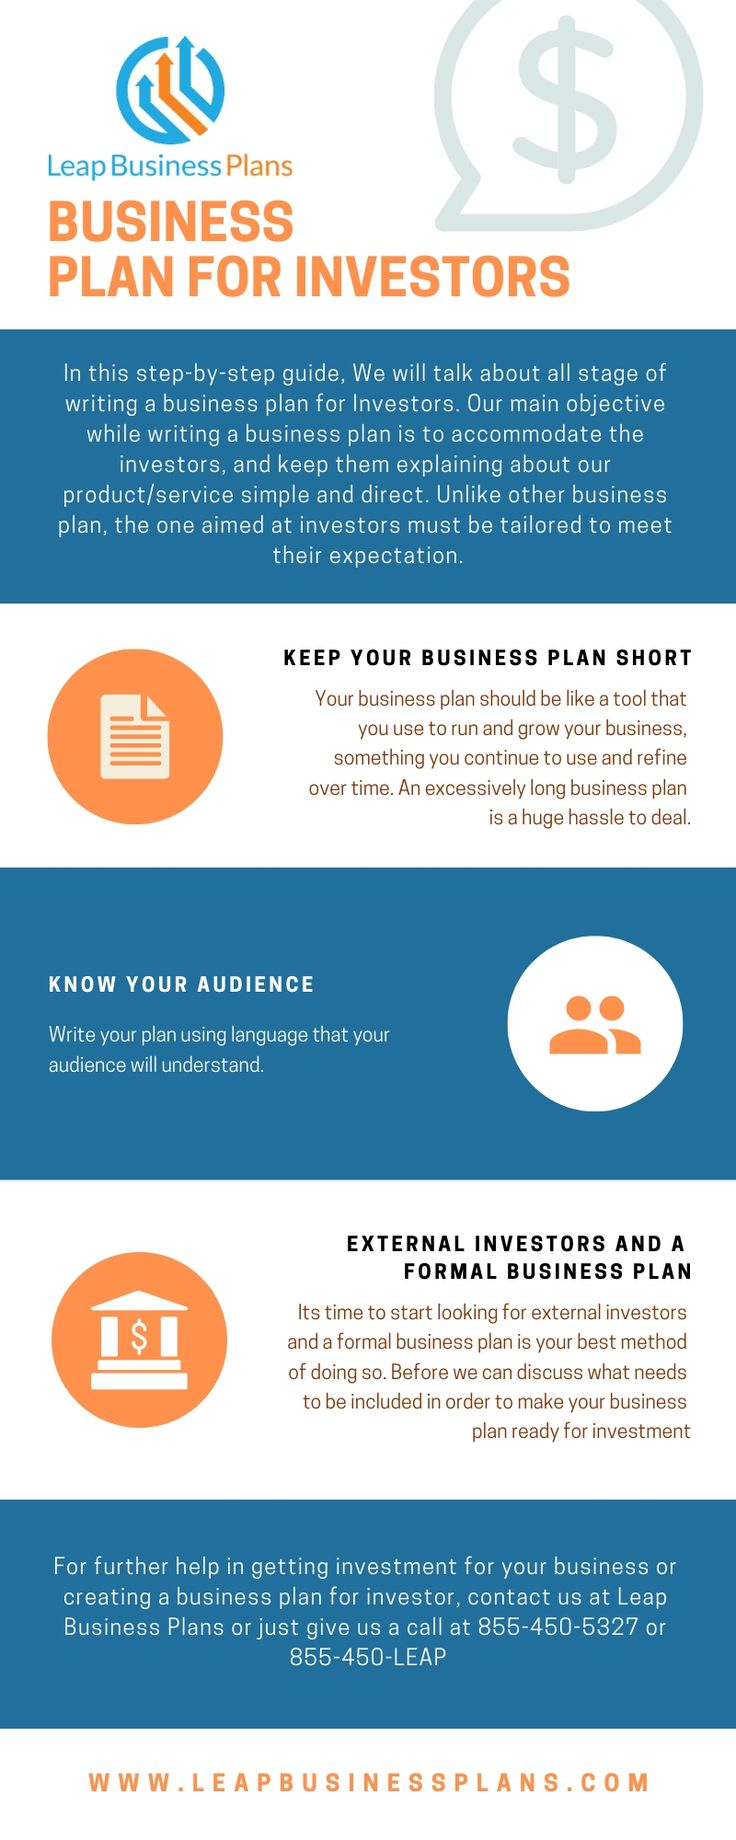 Business Plan for Investors Business investors, Business